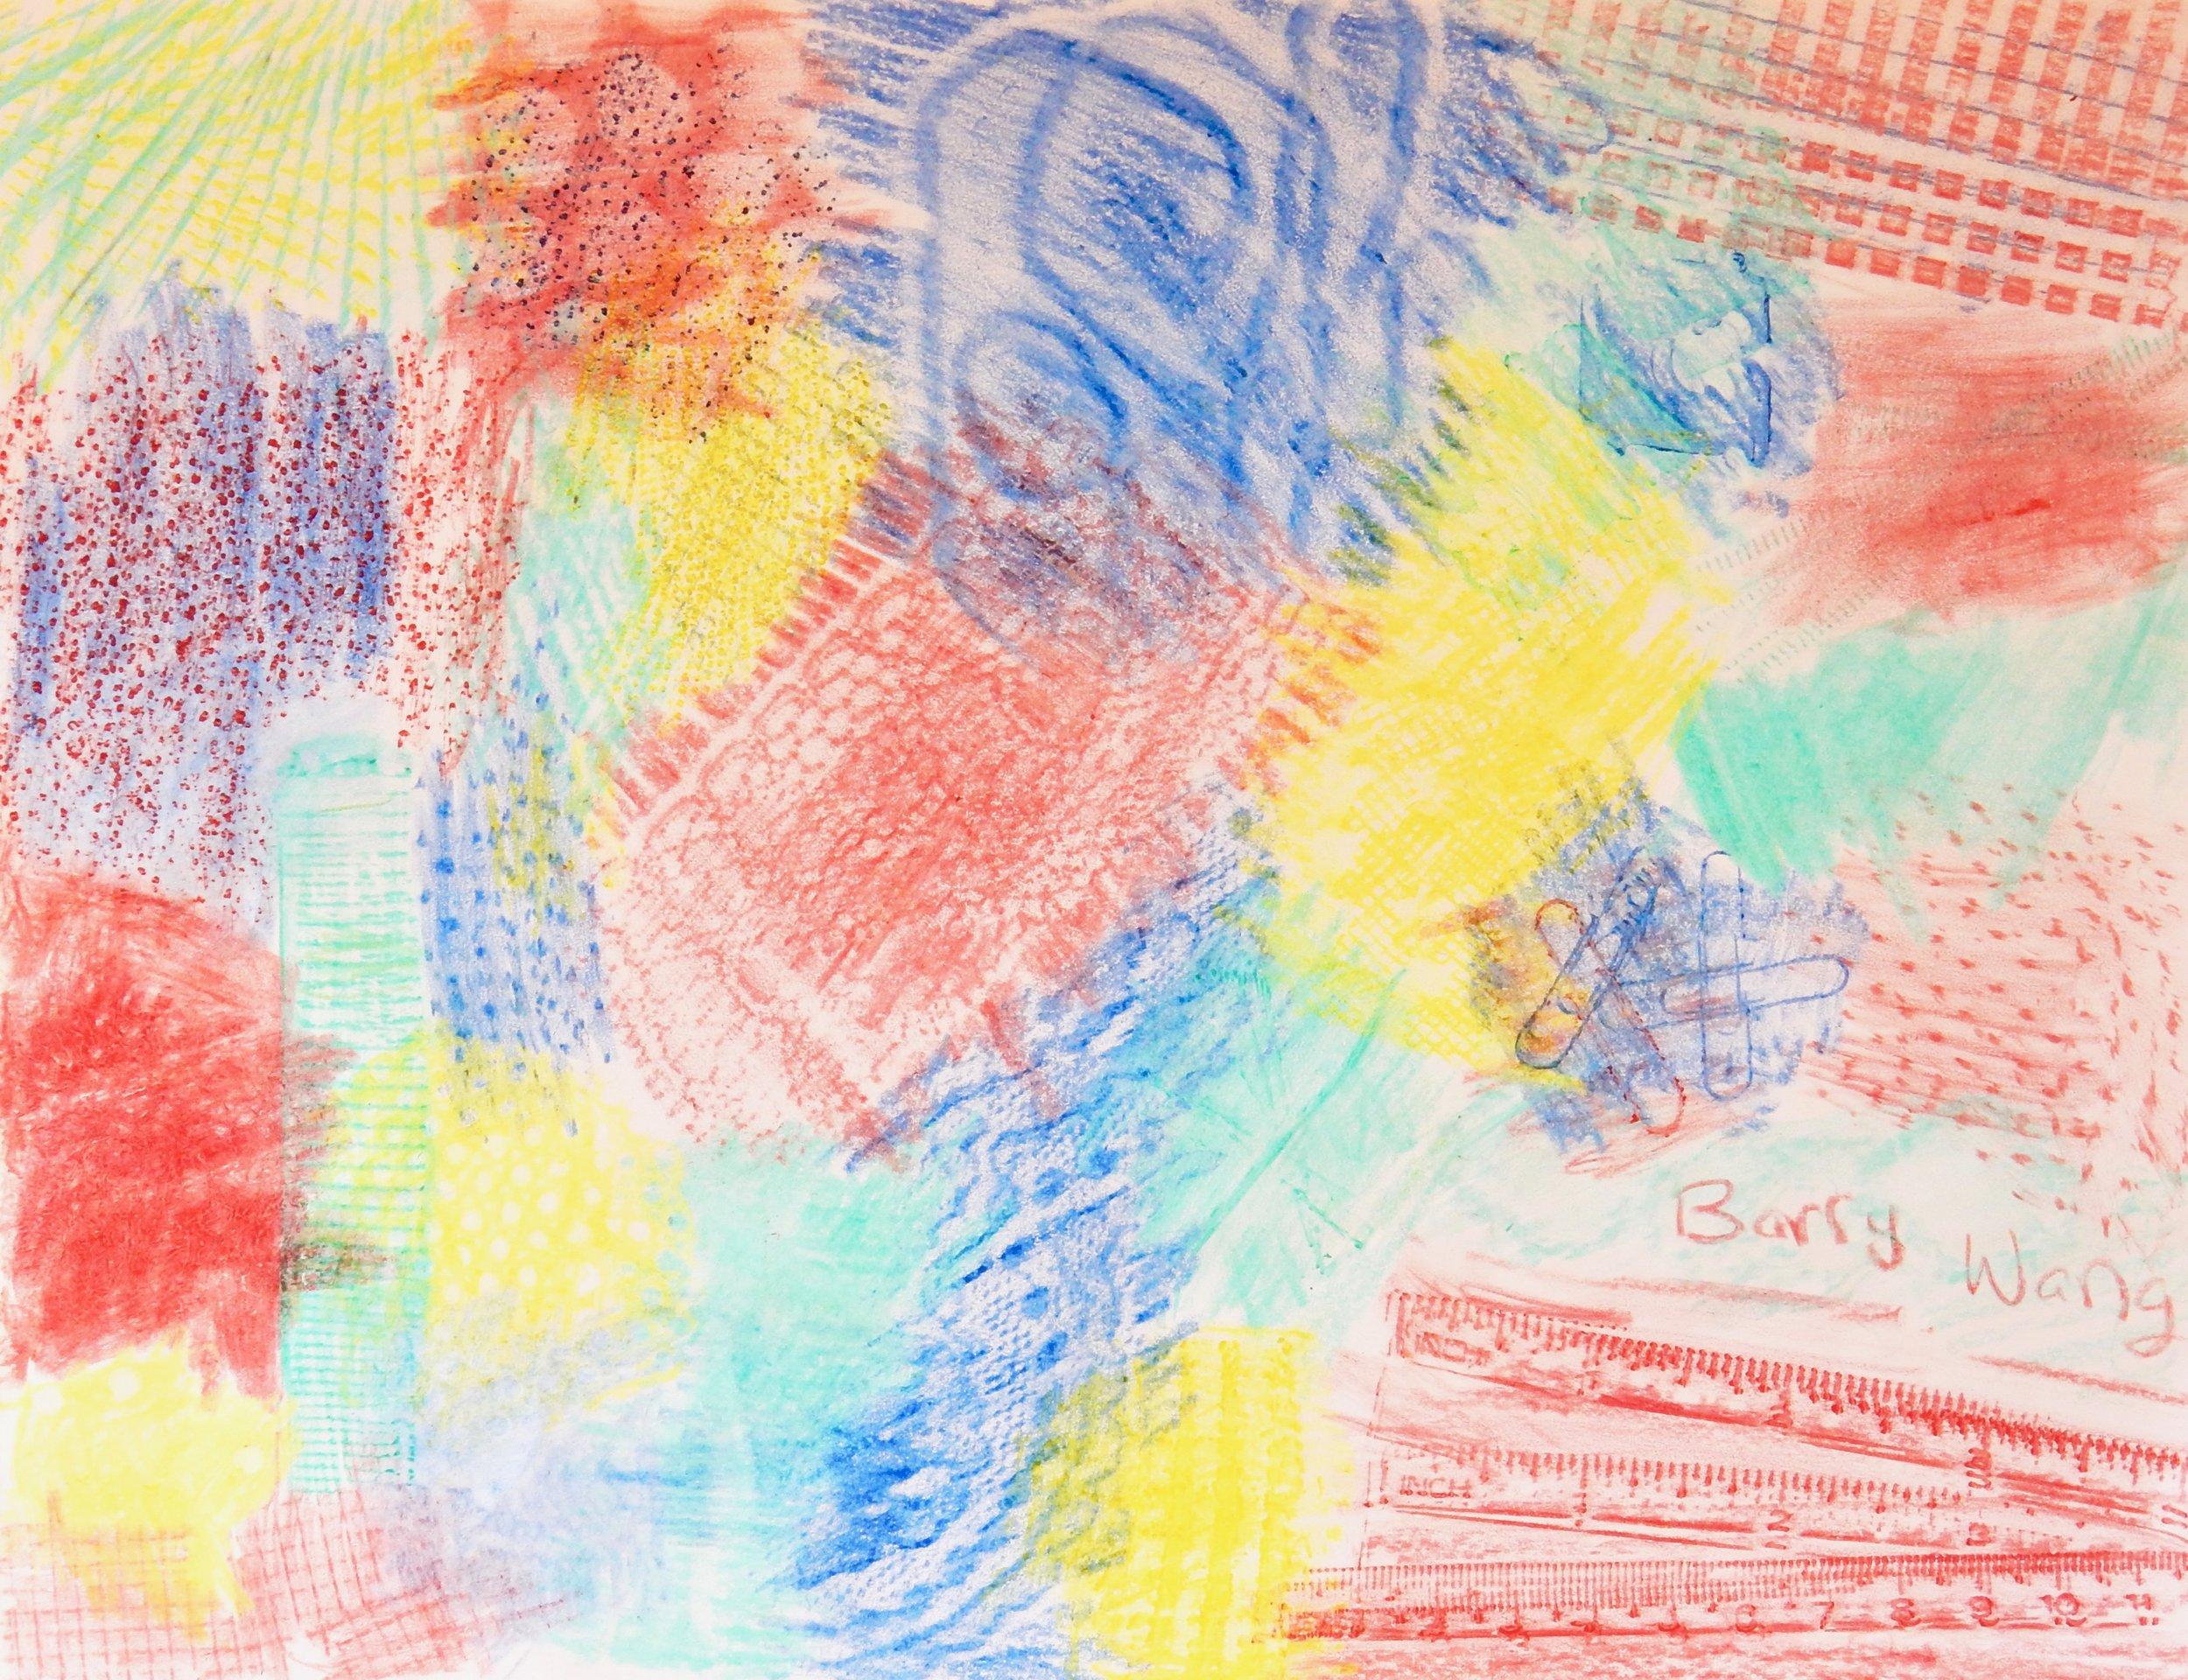 Barry Wang.11yrs.crayon rubbing